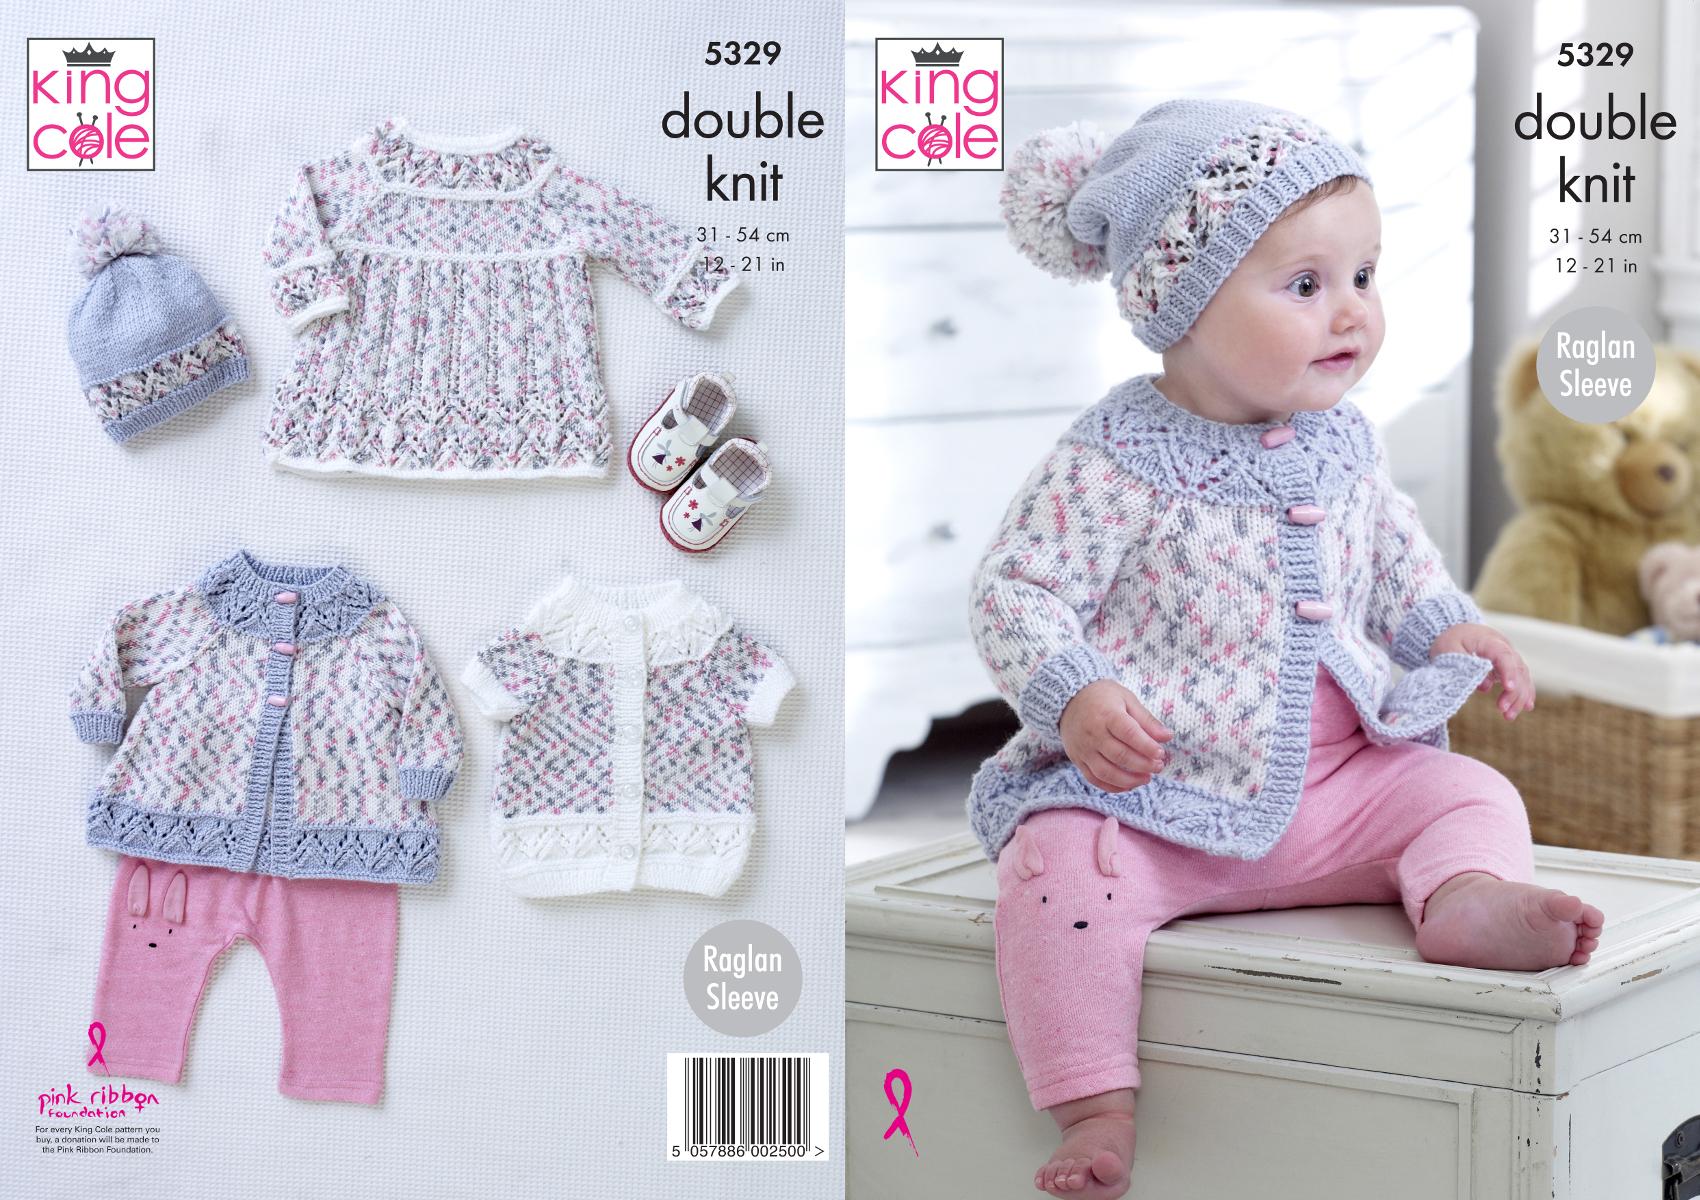 6caf48844b0c6 Baby Double Knitting Pattern Raglan Dress Coat Cardigan   Hat King ...